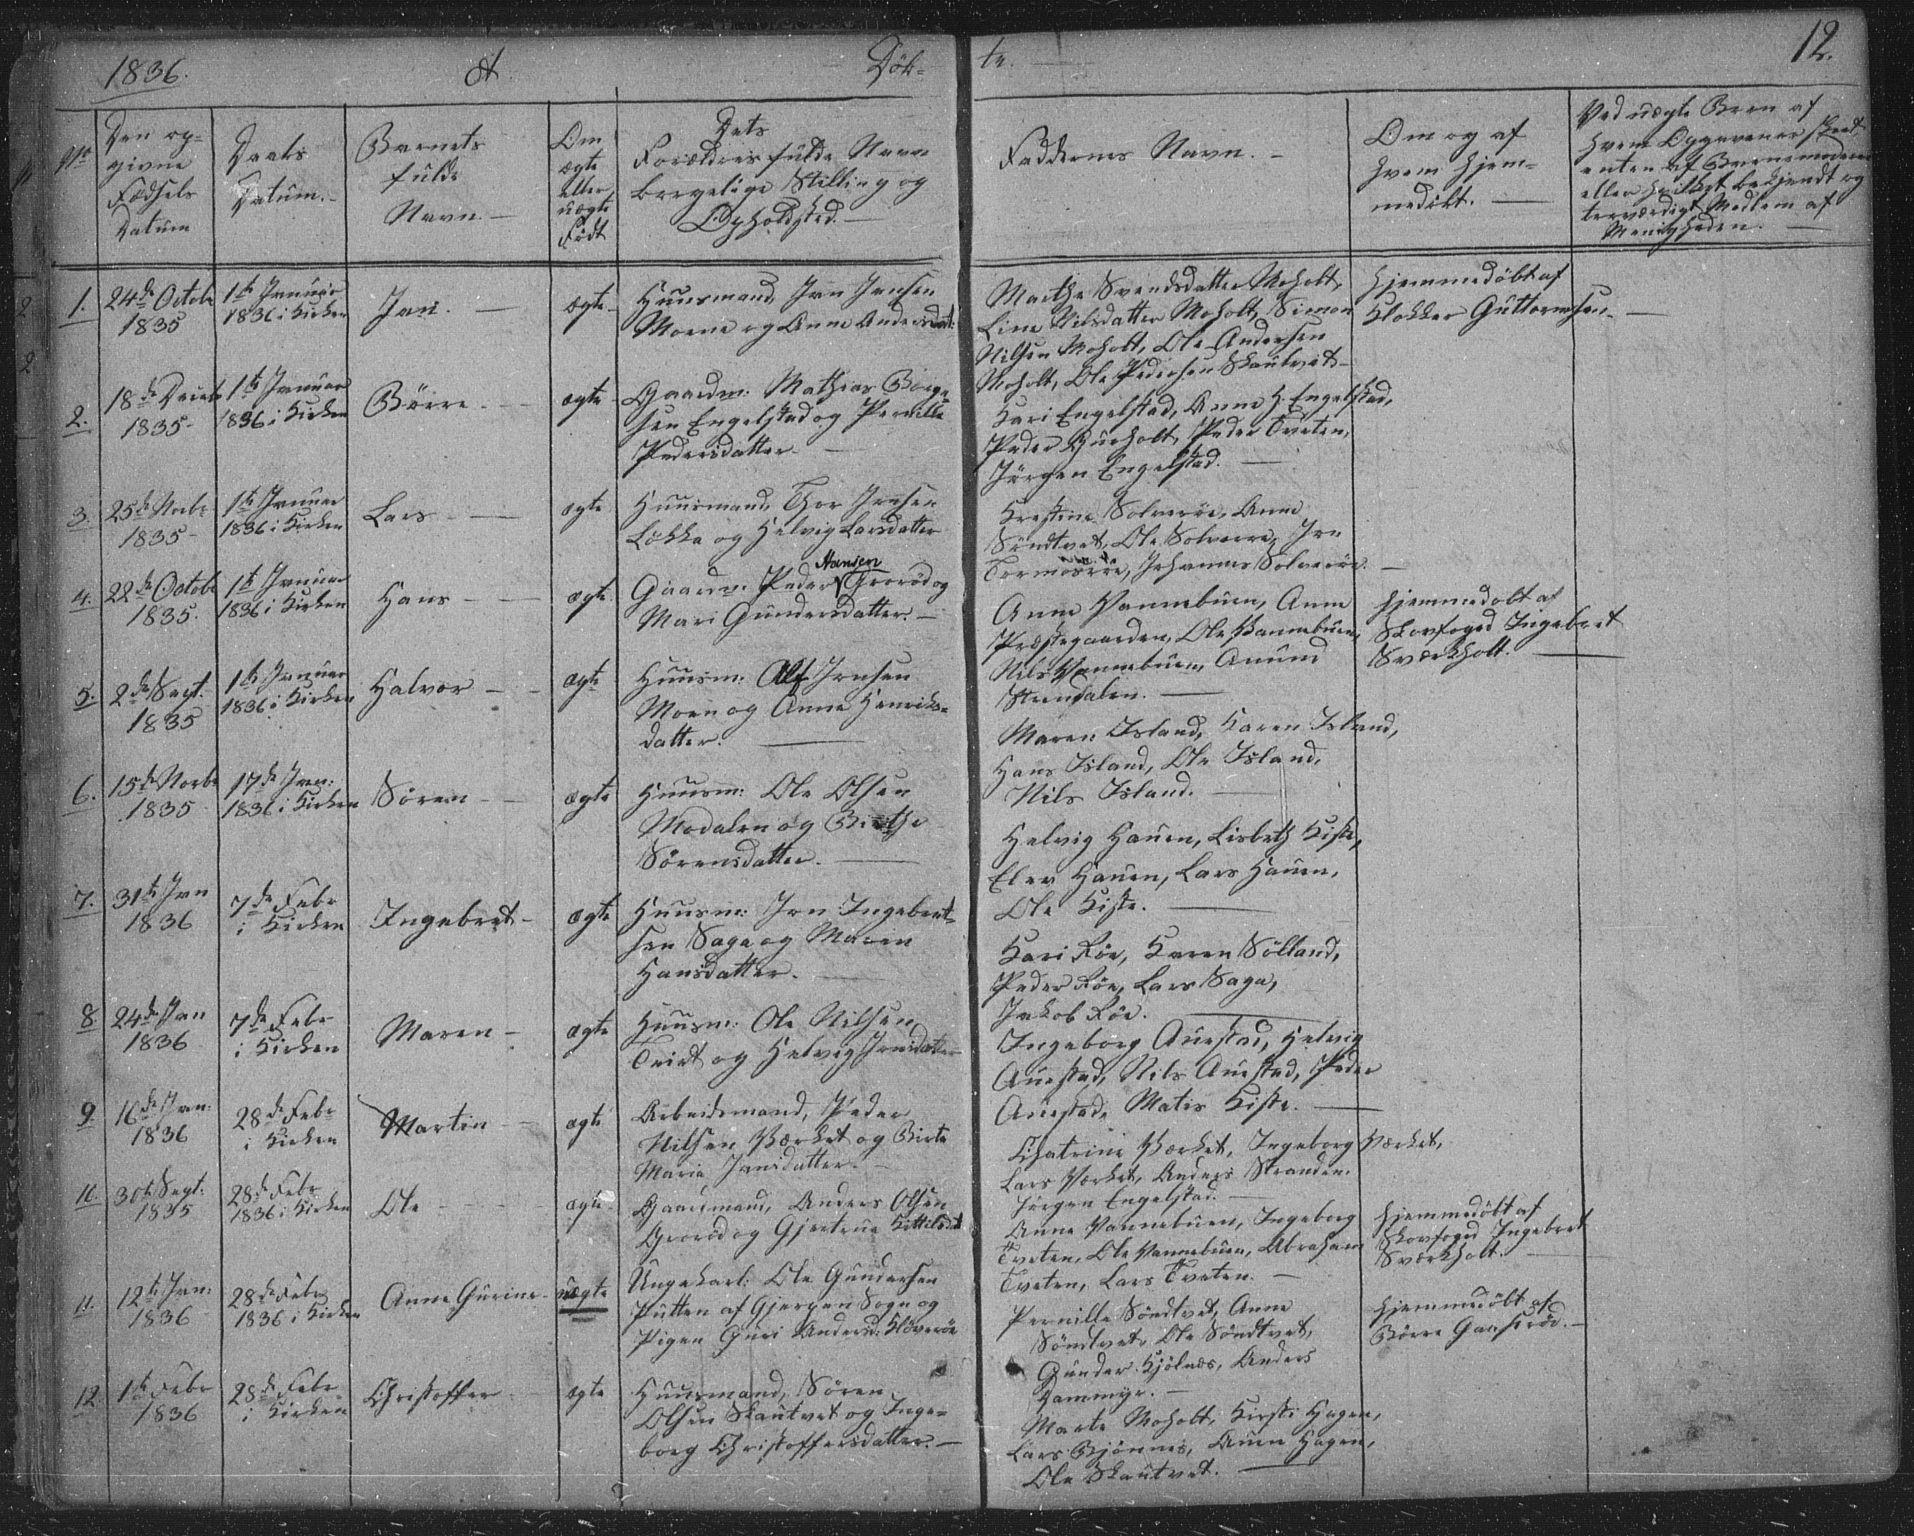 SAKO, Siljan kirkebøker, F/Fa/L0001: Parish register (official) no. 1, 1831-1870, p. 12